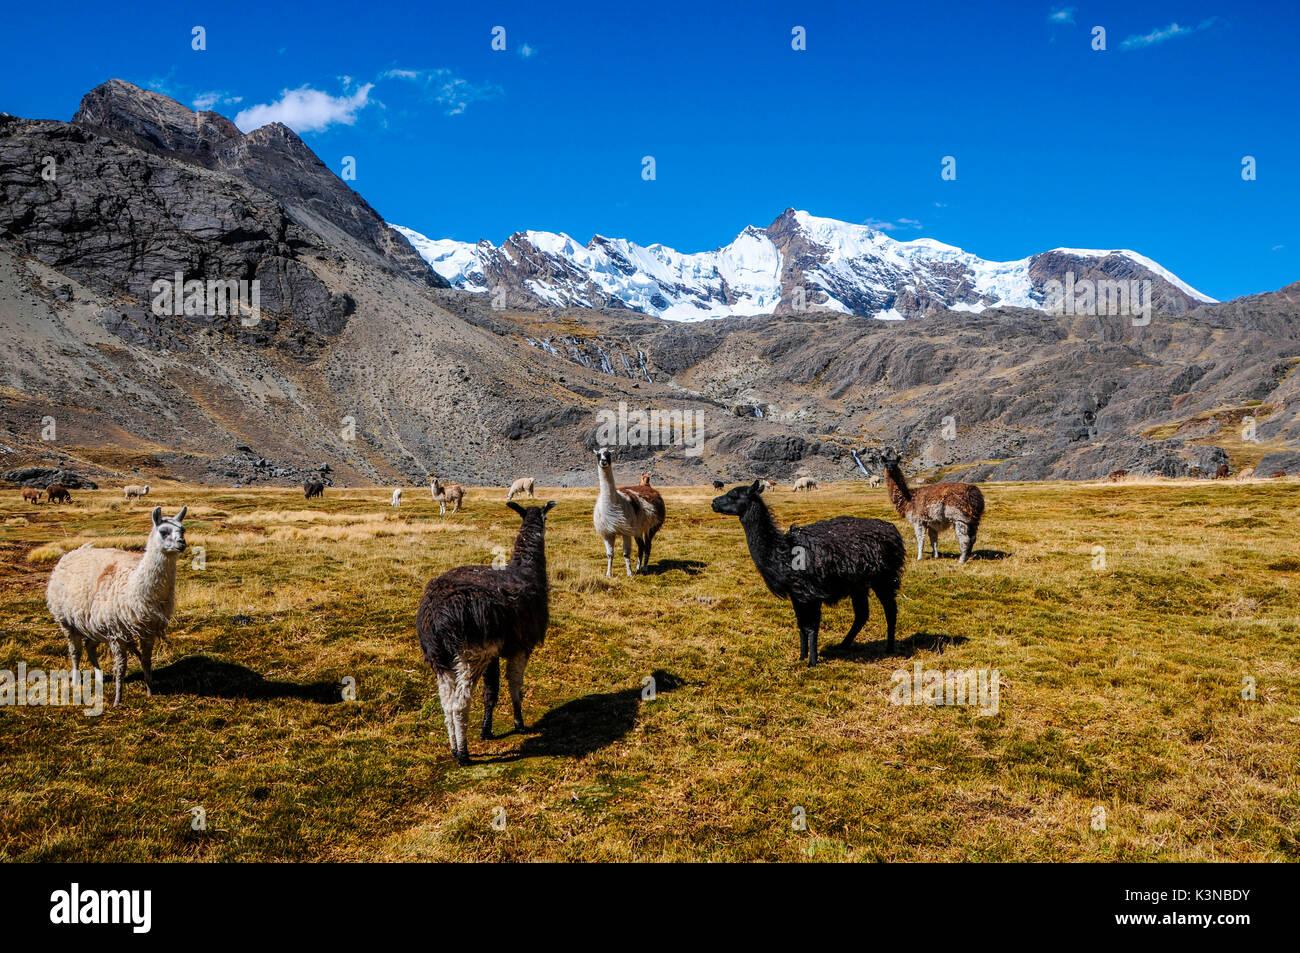 Bolivia, La Paz district, Llamas in the Bolivian plateau - Stock Image